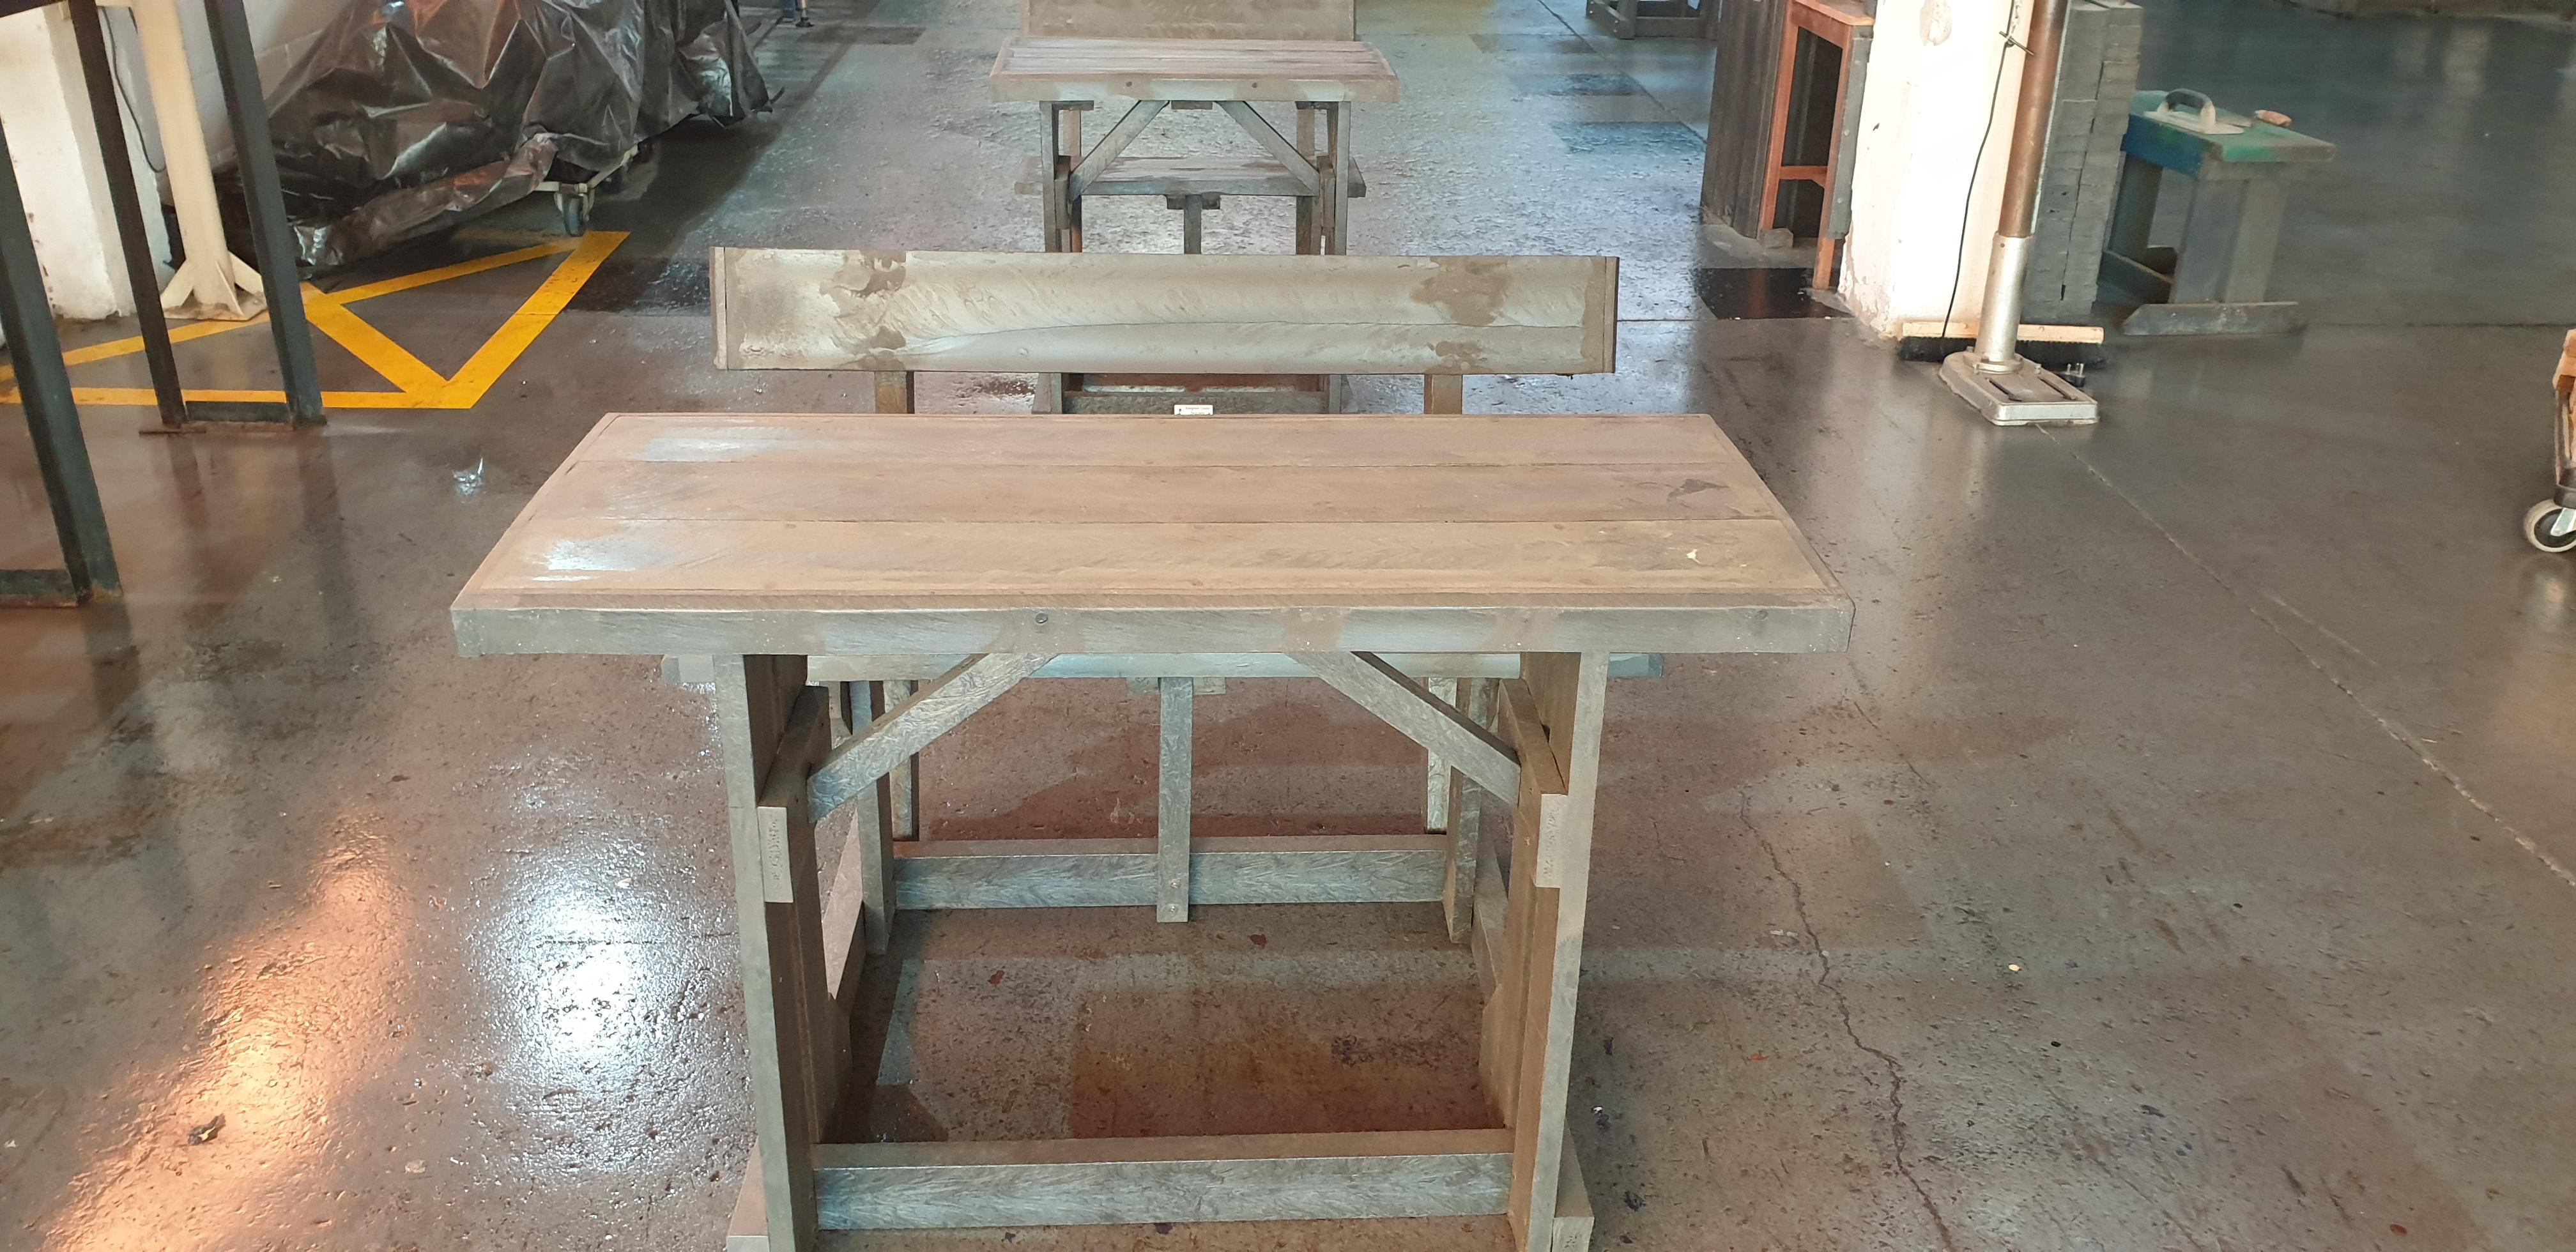 2-Seater School Desk